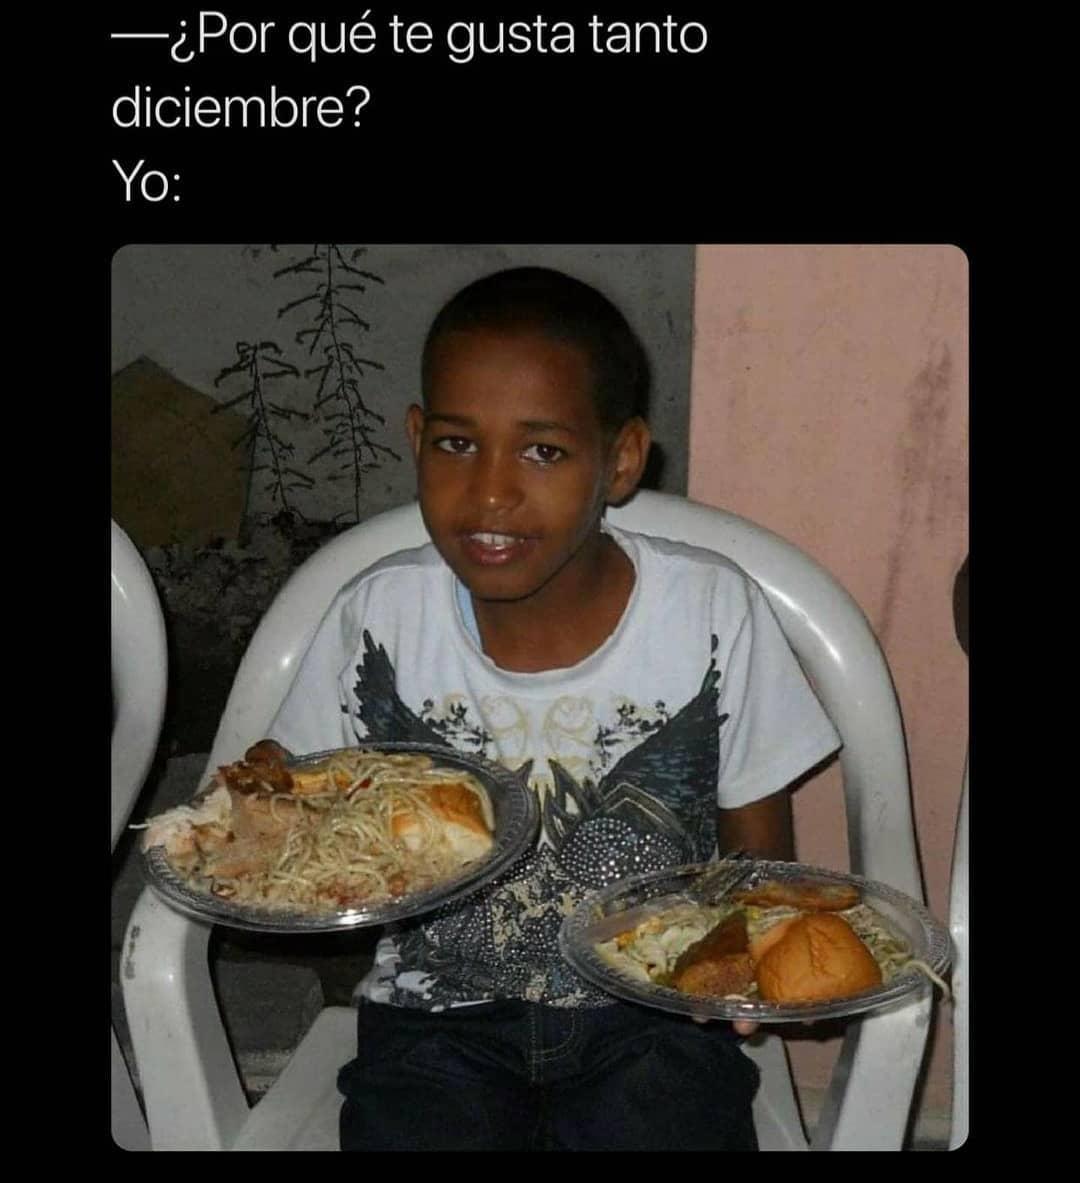 ¿Por qué te gusta tanto diciembre?  Yo: